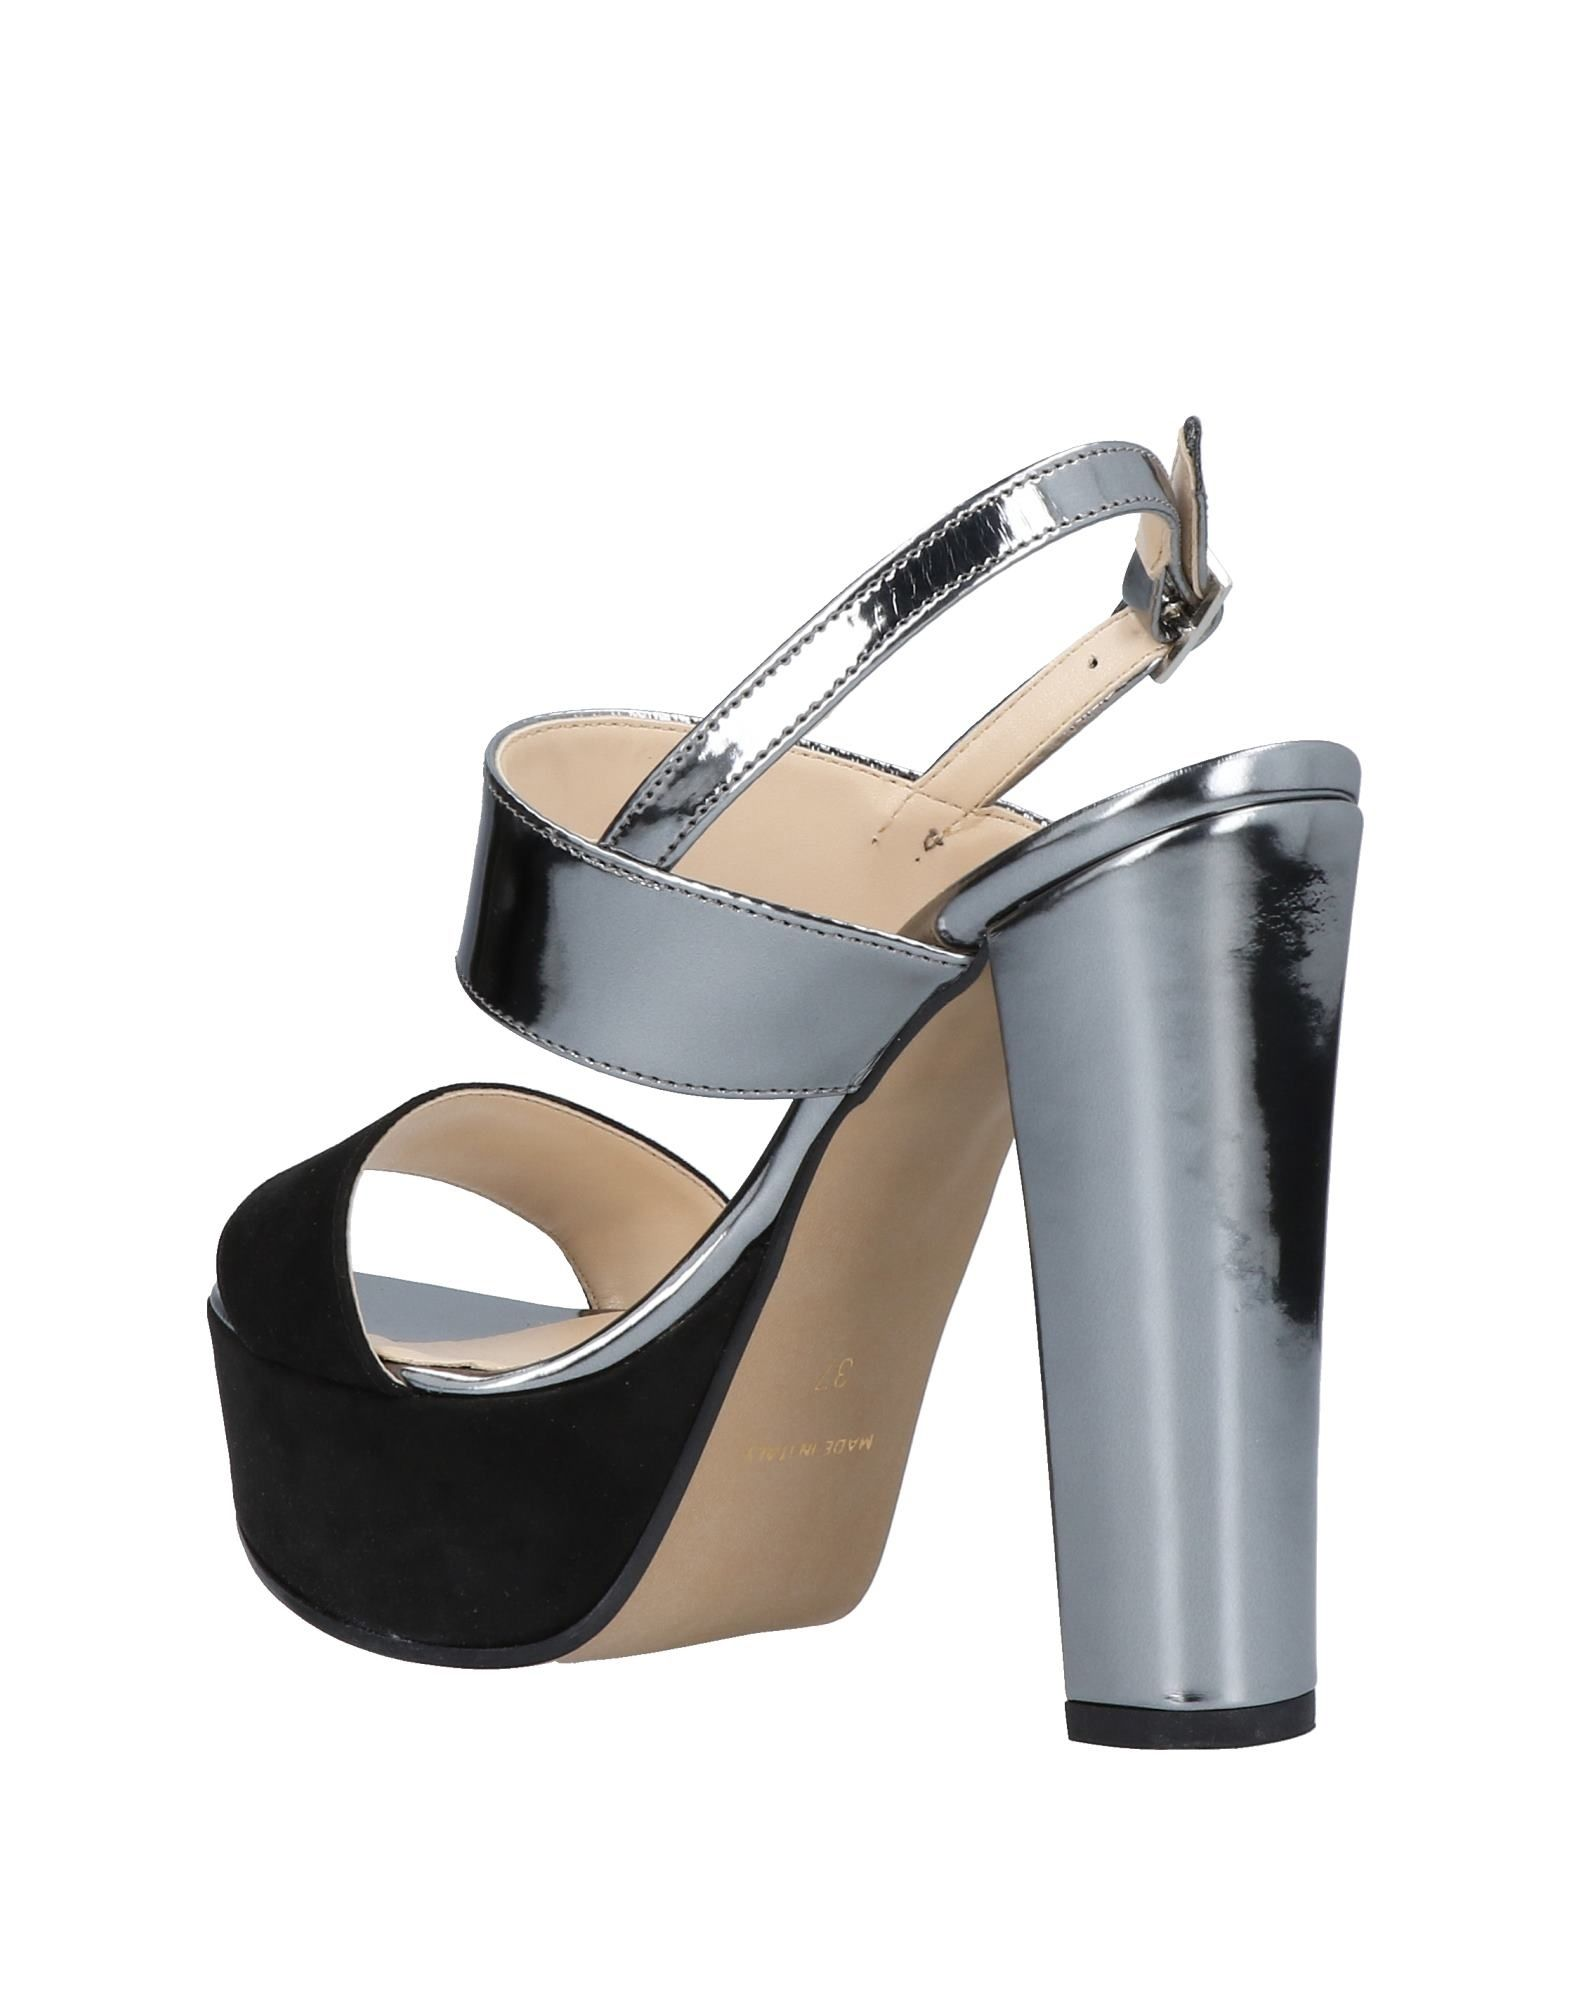 Morena Calzature Italiane Sandalen Damen   Damen 11462888FL Gute Qualität beliebte Schuhe c6f157